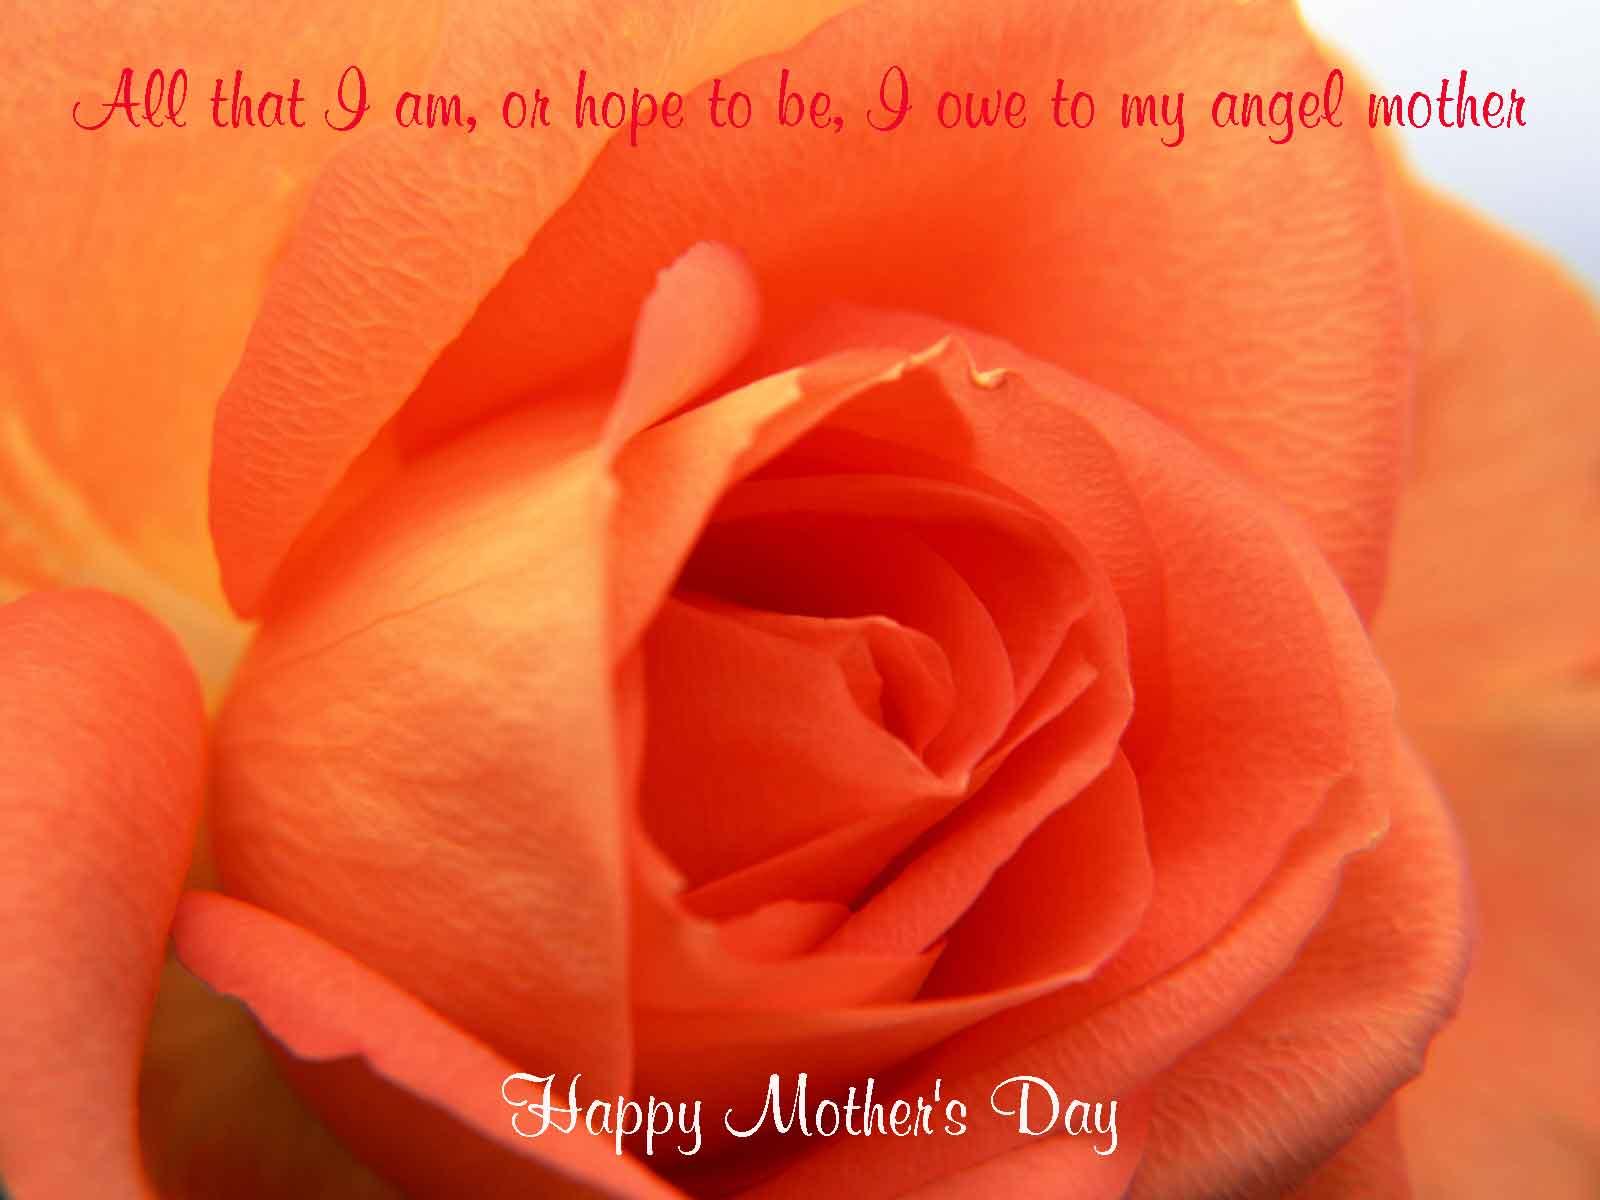 http://2.bp.blogspot.com/-N6MbE7G0Z64/T5i4UAYruHI/AAAAAAAADZM/kKlM2WUMiyg/s1600/Happy-Mothers-Day-Quote.jpg